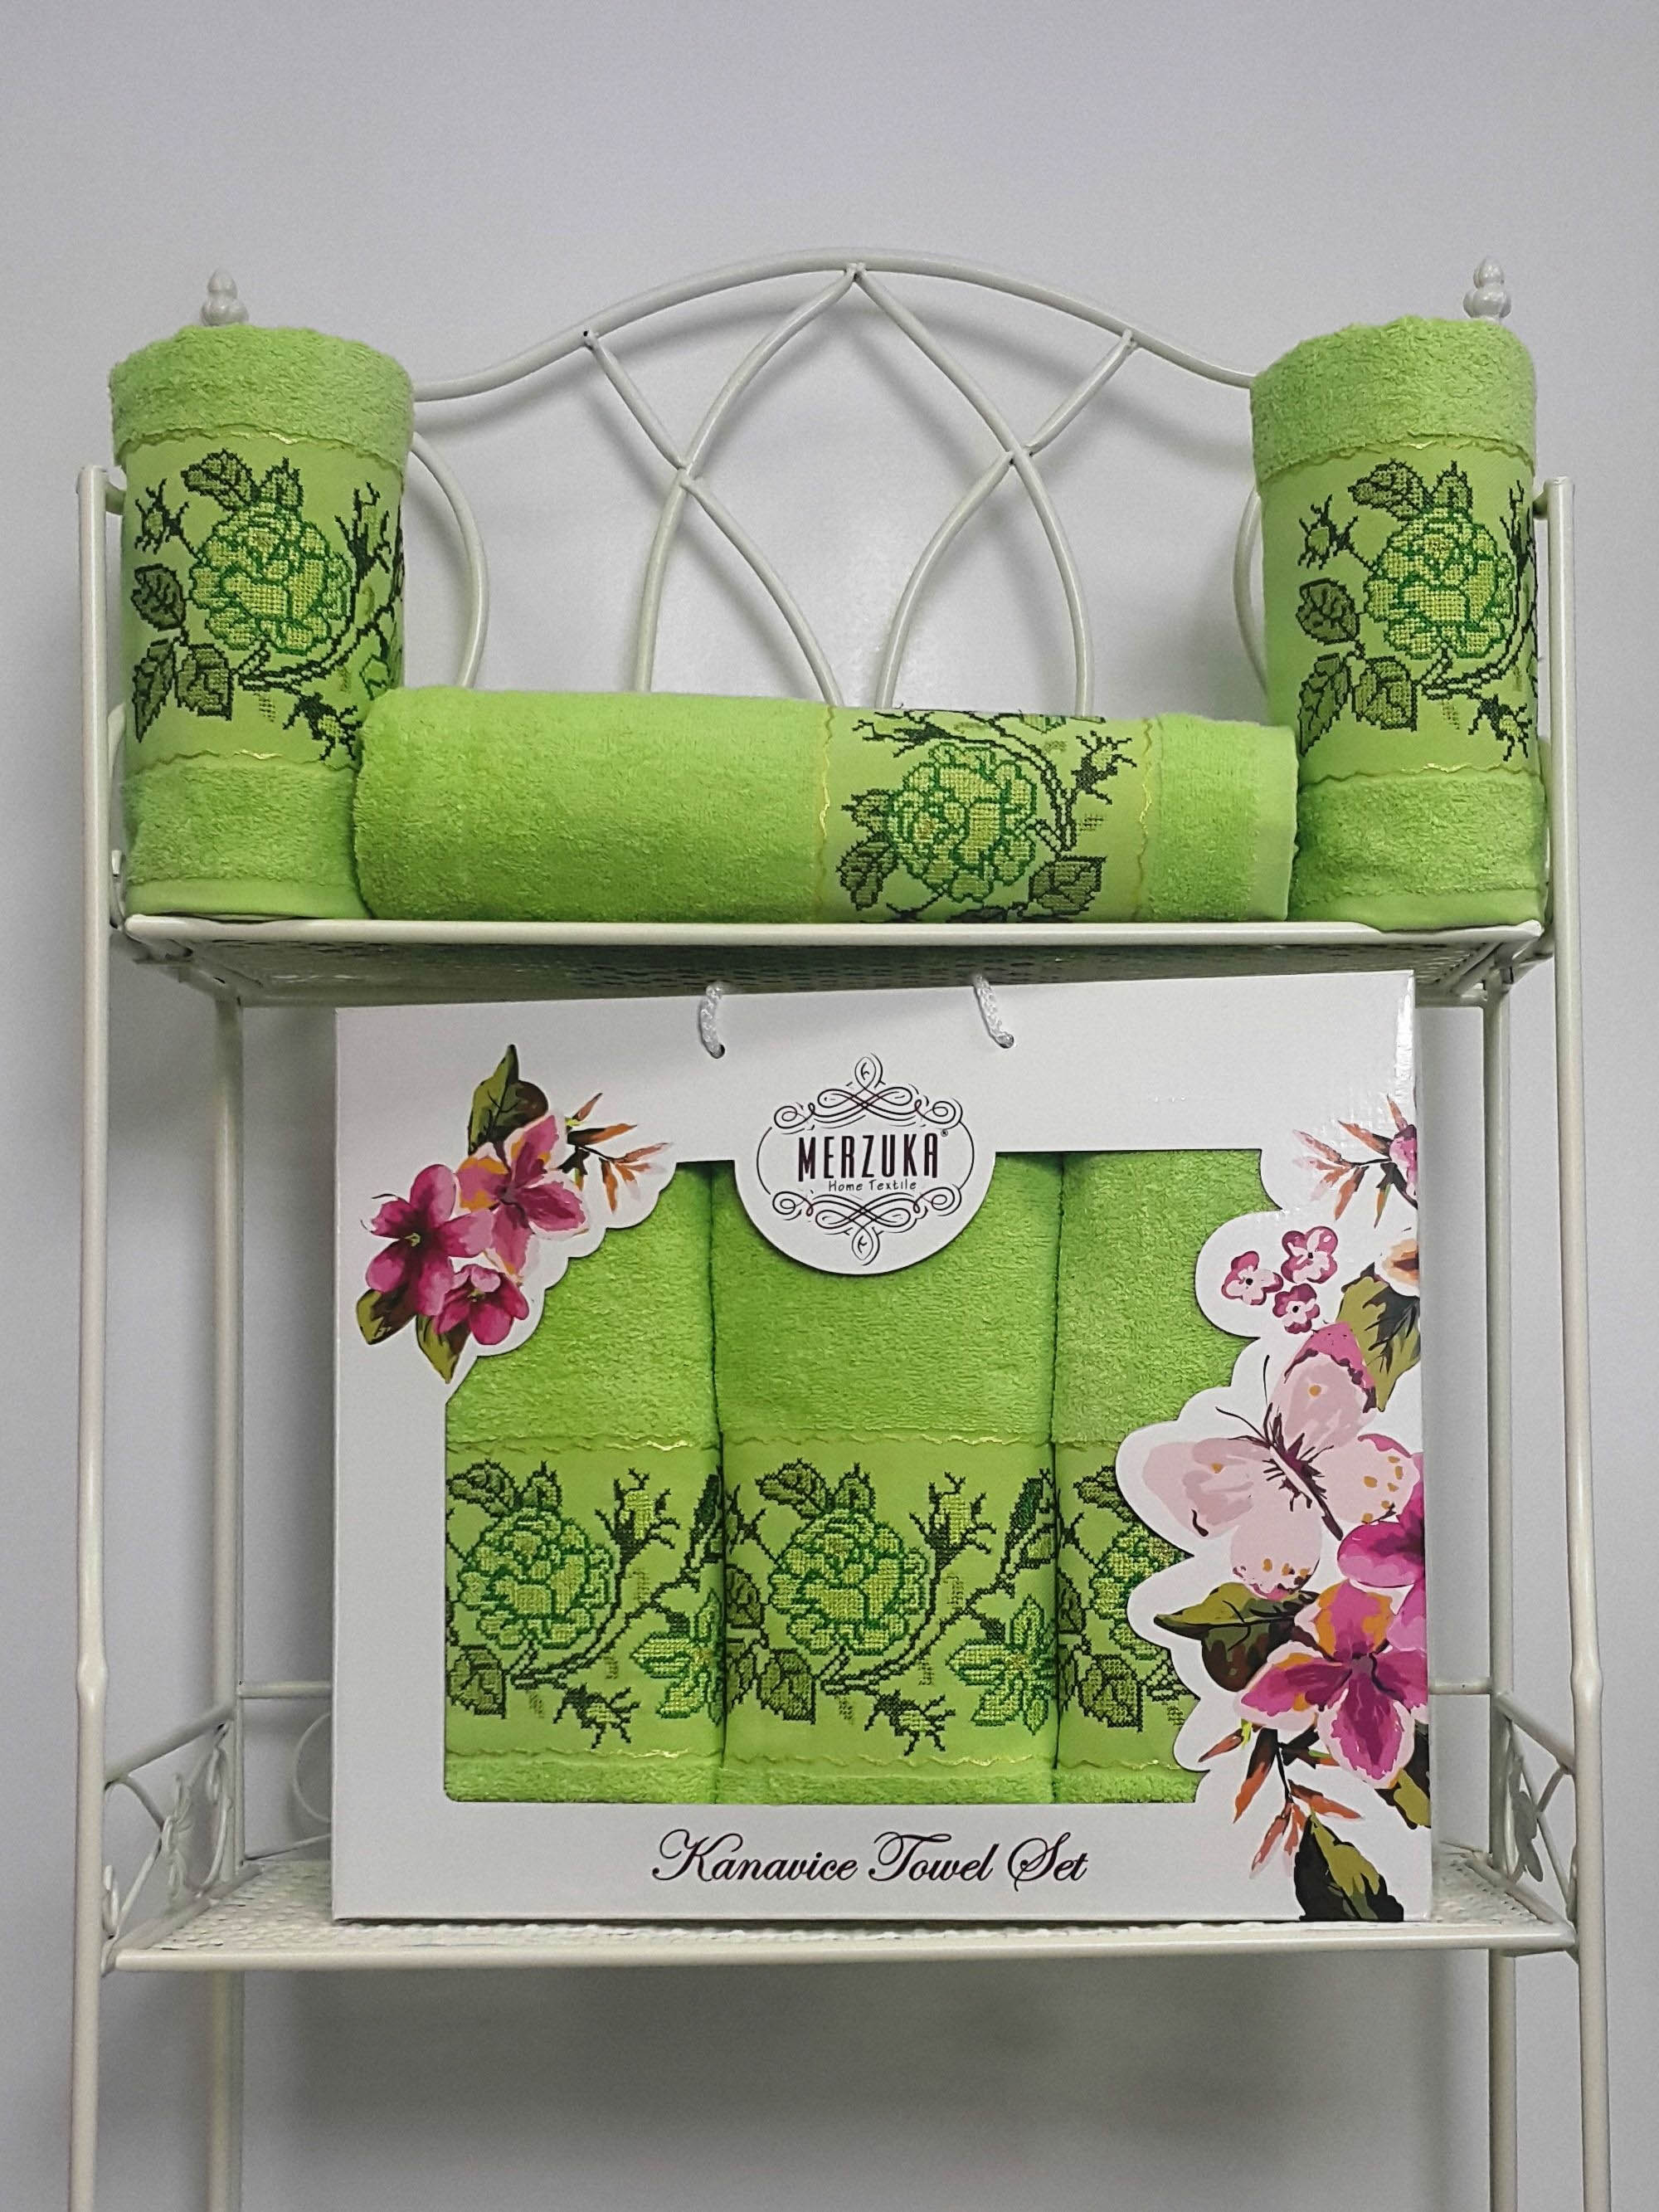 Полотенца Oran Merzuka Полотенце Kanavice Цвет: Зелёный (Набор) набор из 3 полотенец merzuka sakura 50х90 2 70х140 8432 оранжевый